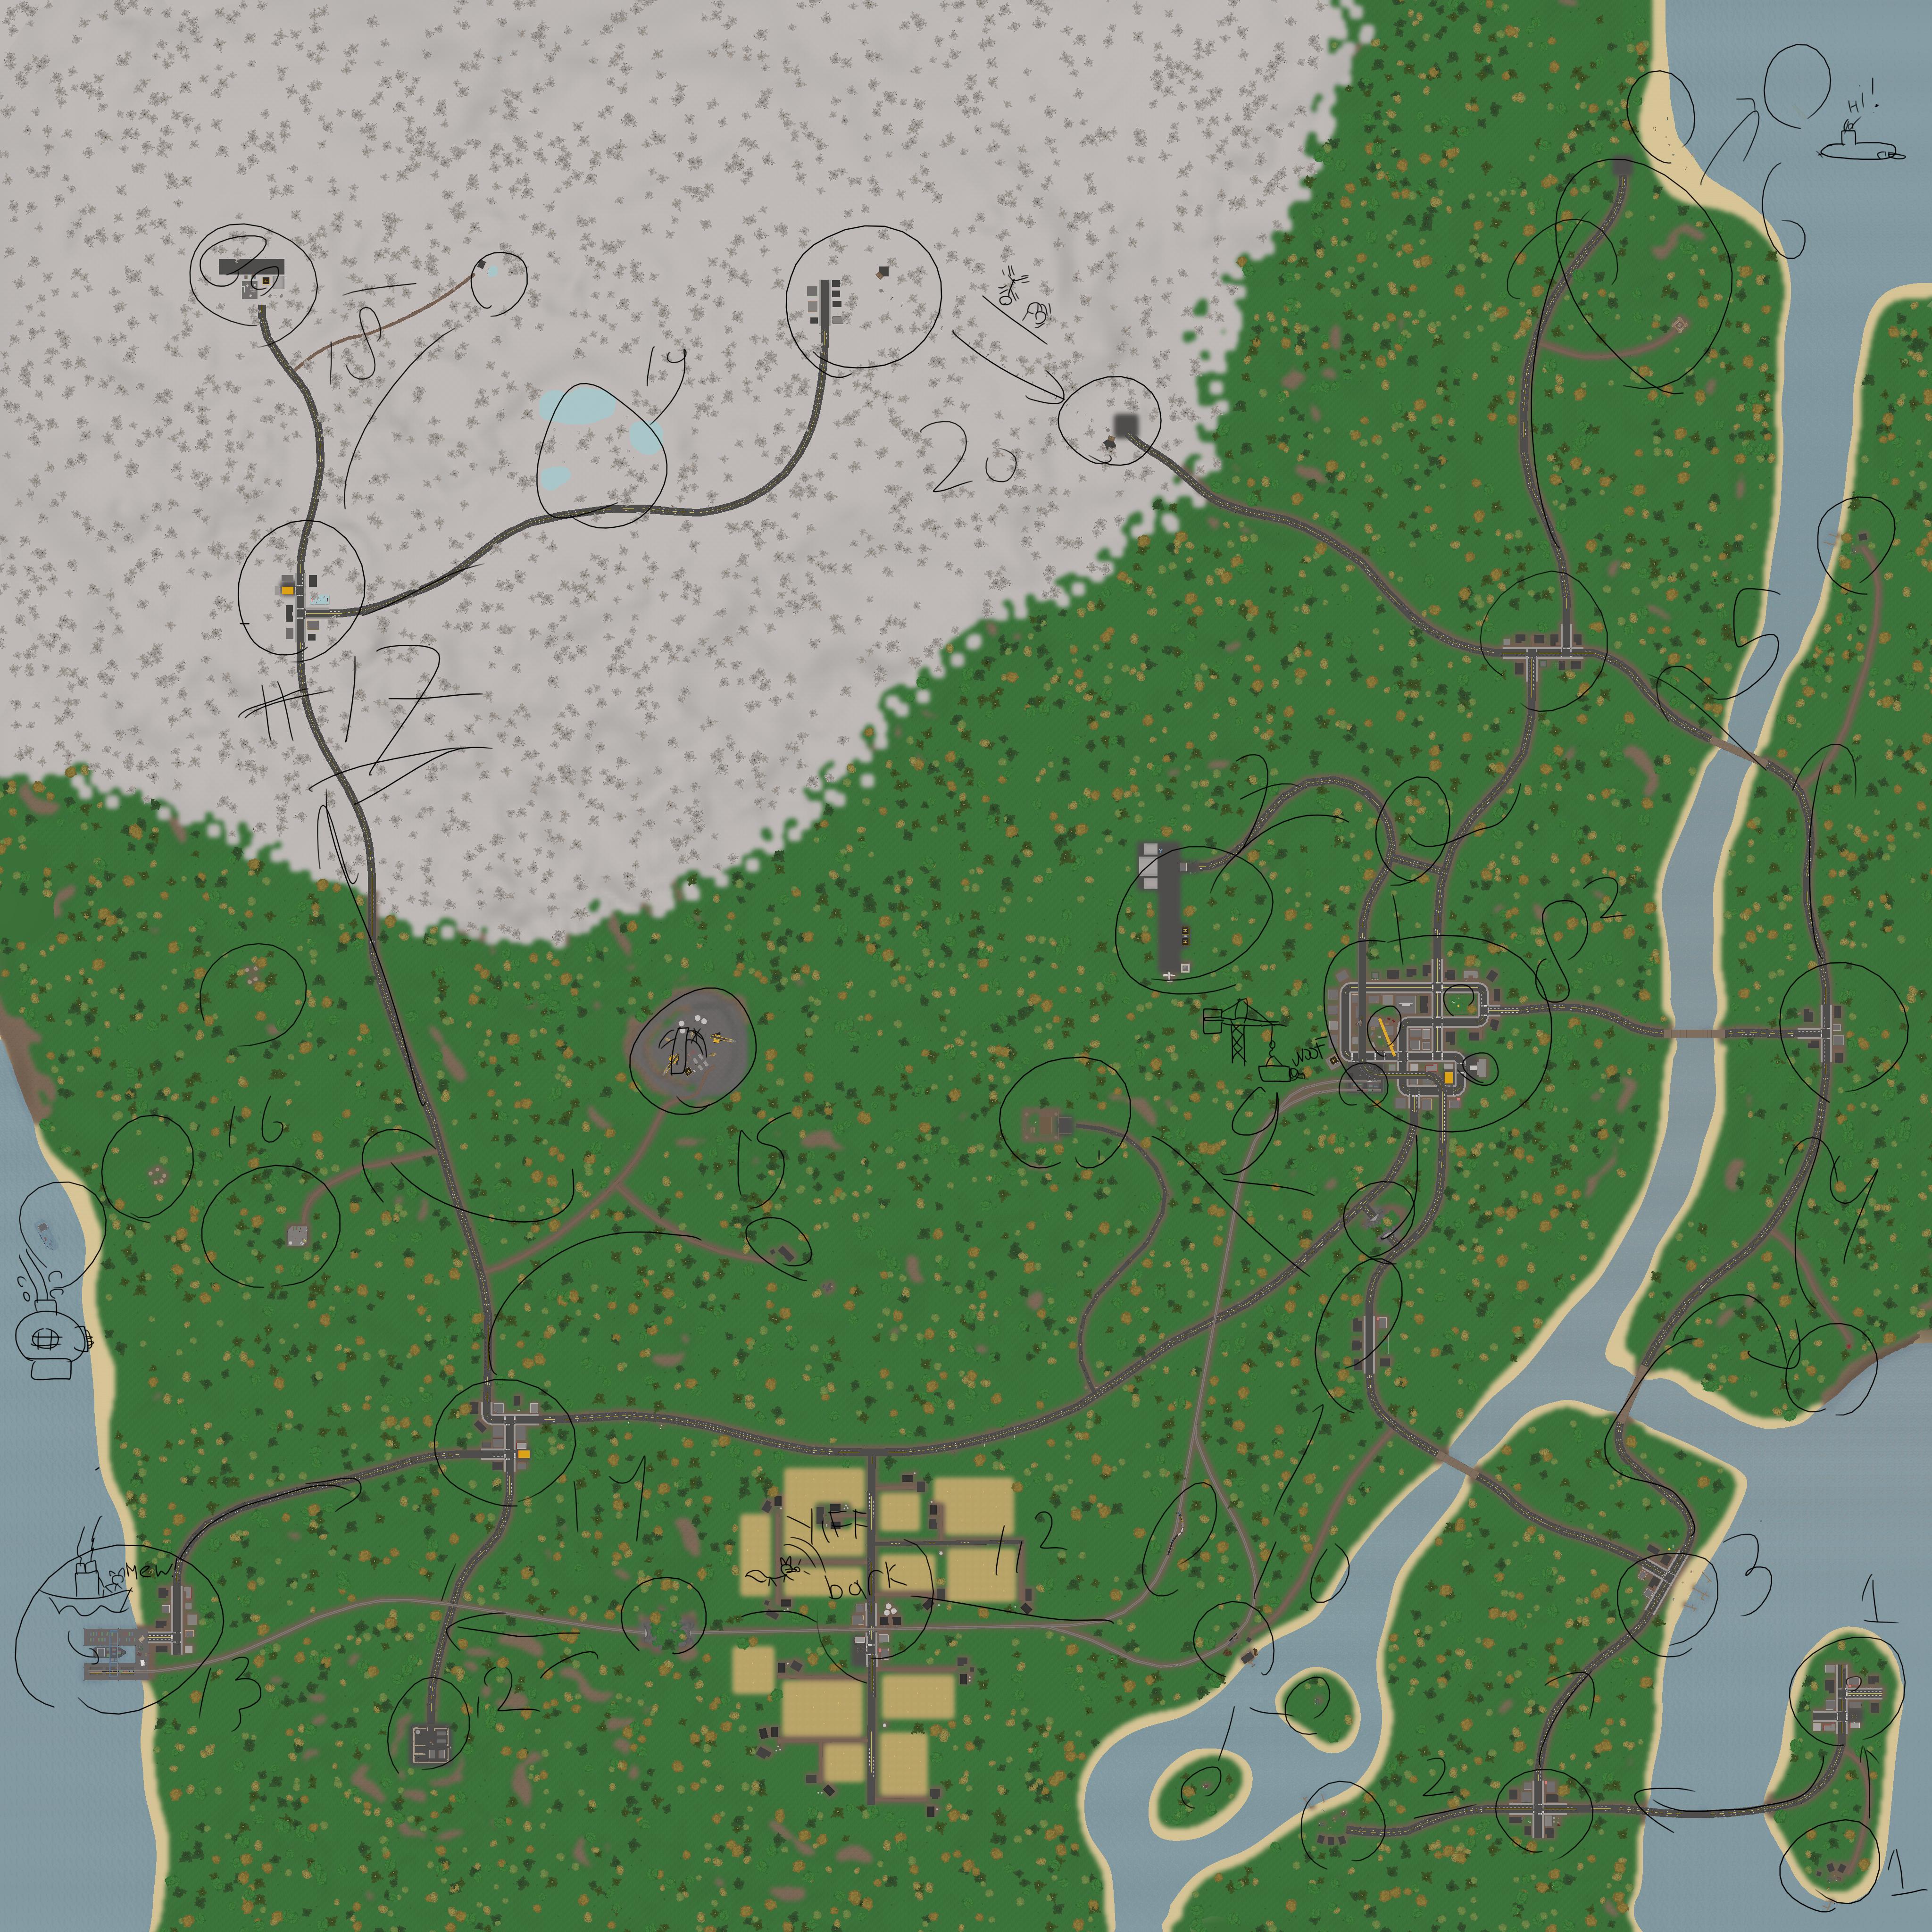 Unturned Canada Map Trip By MechAh On DeviantArt - Japan map unturned